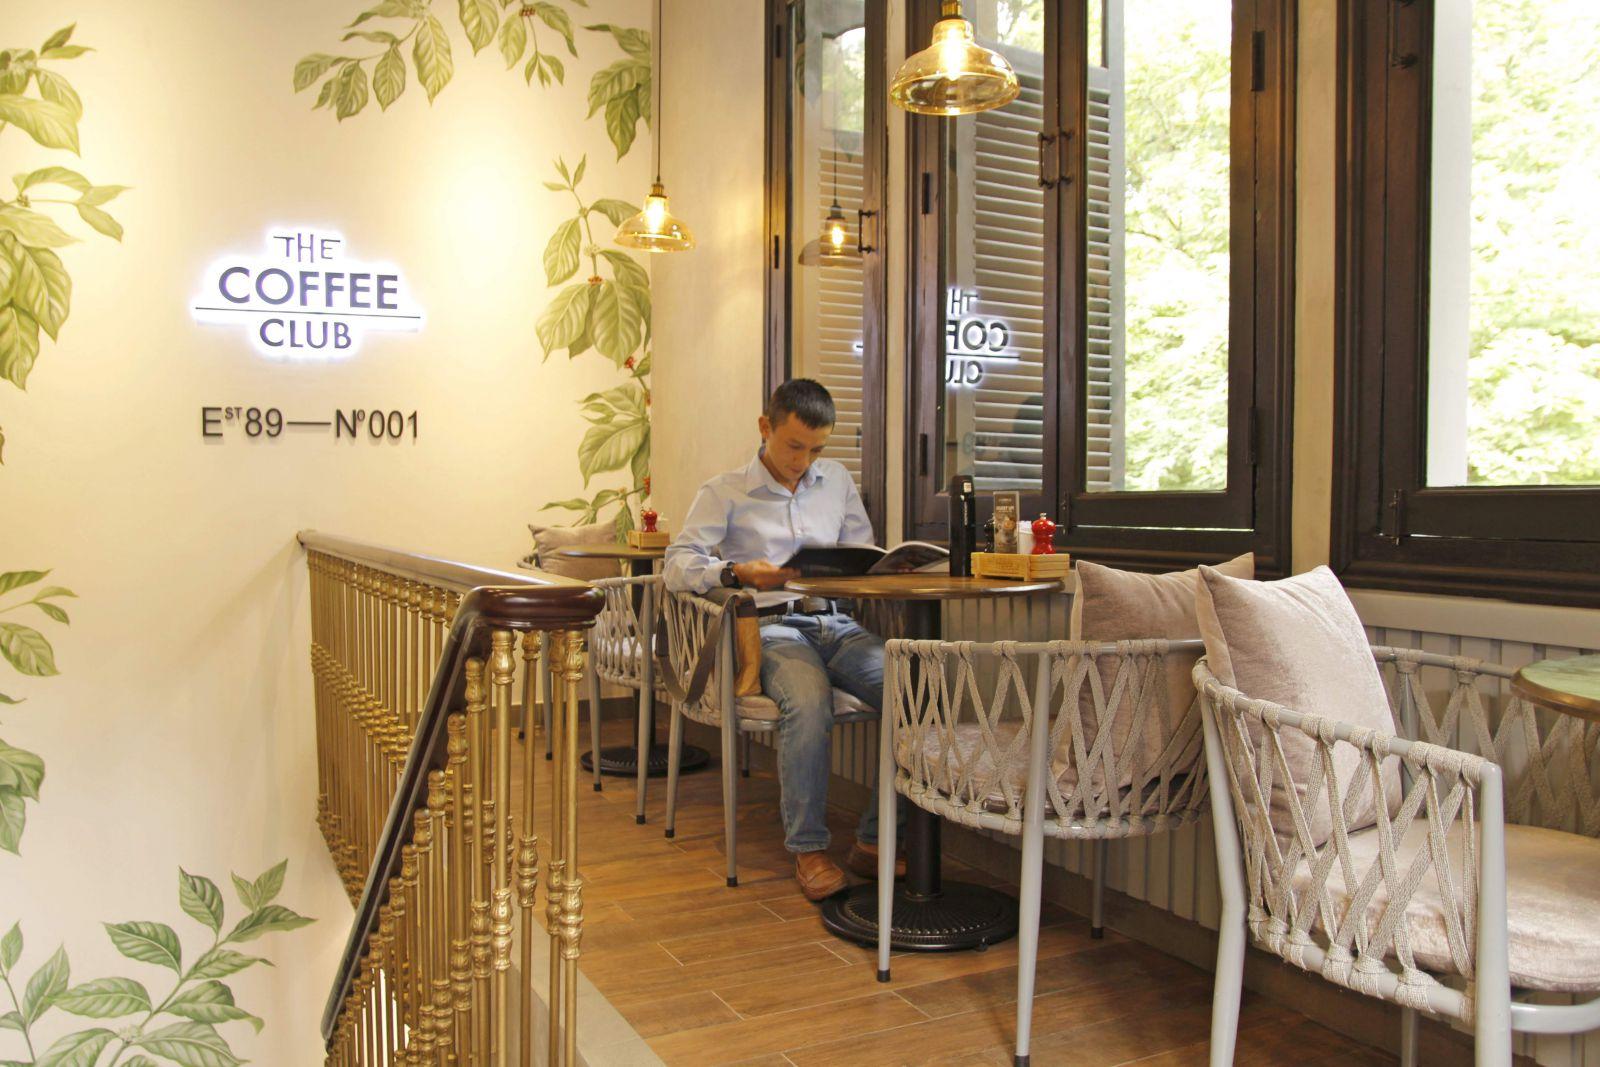 khong-gian-noi-that-quan-cafe-the-coffee-club-tai-quan-1-tphcm